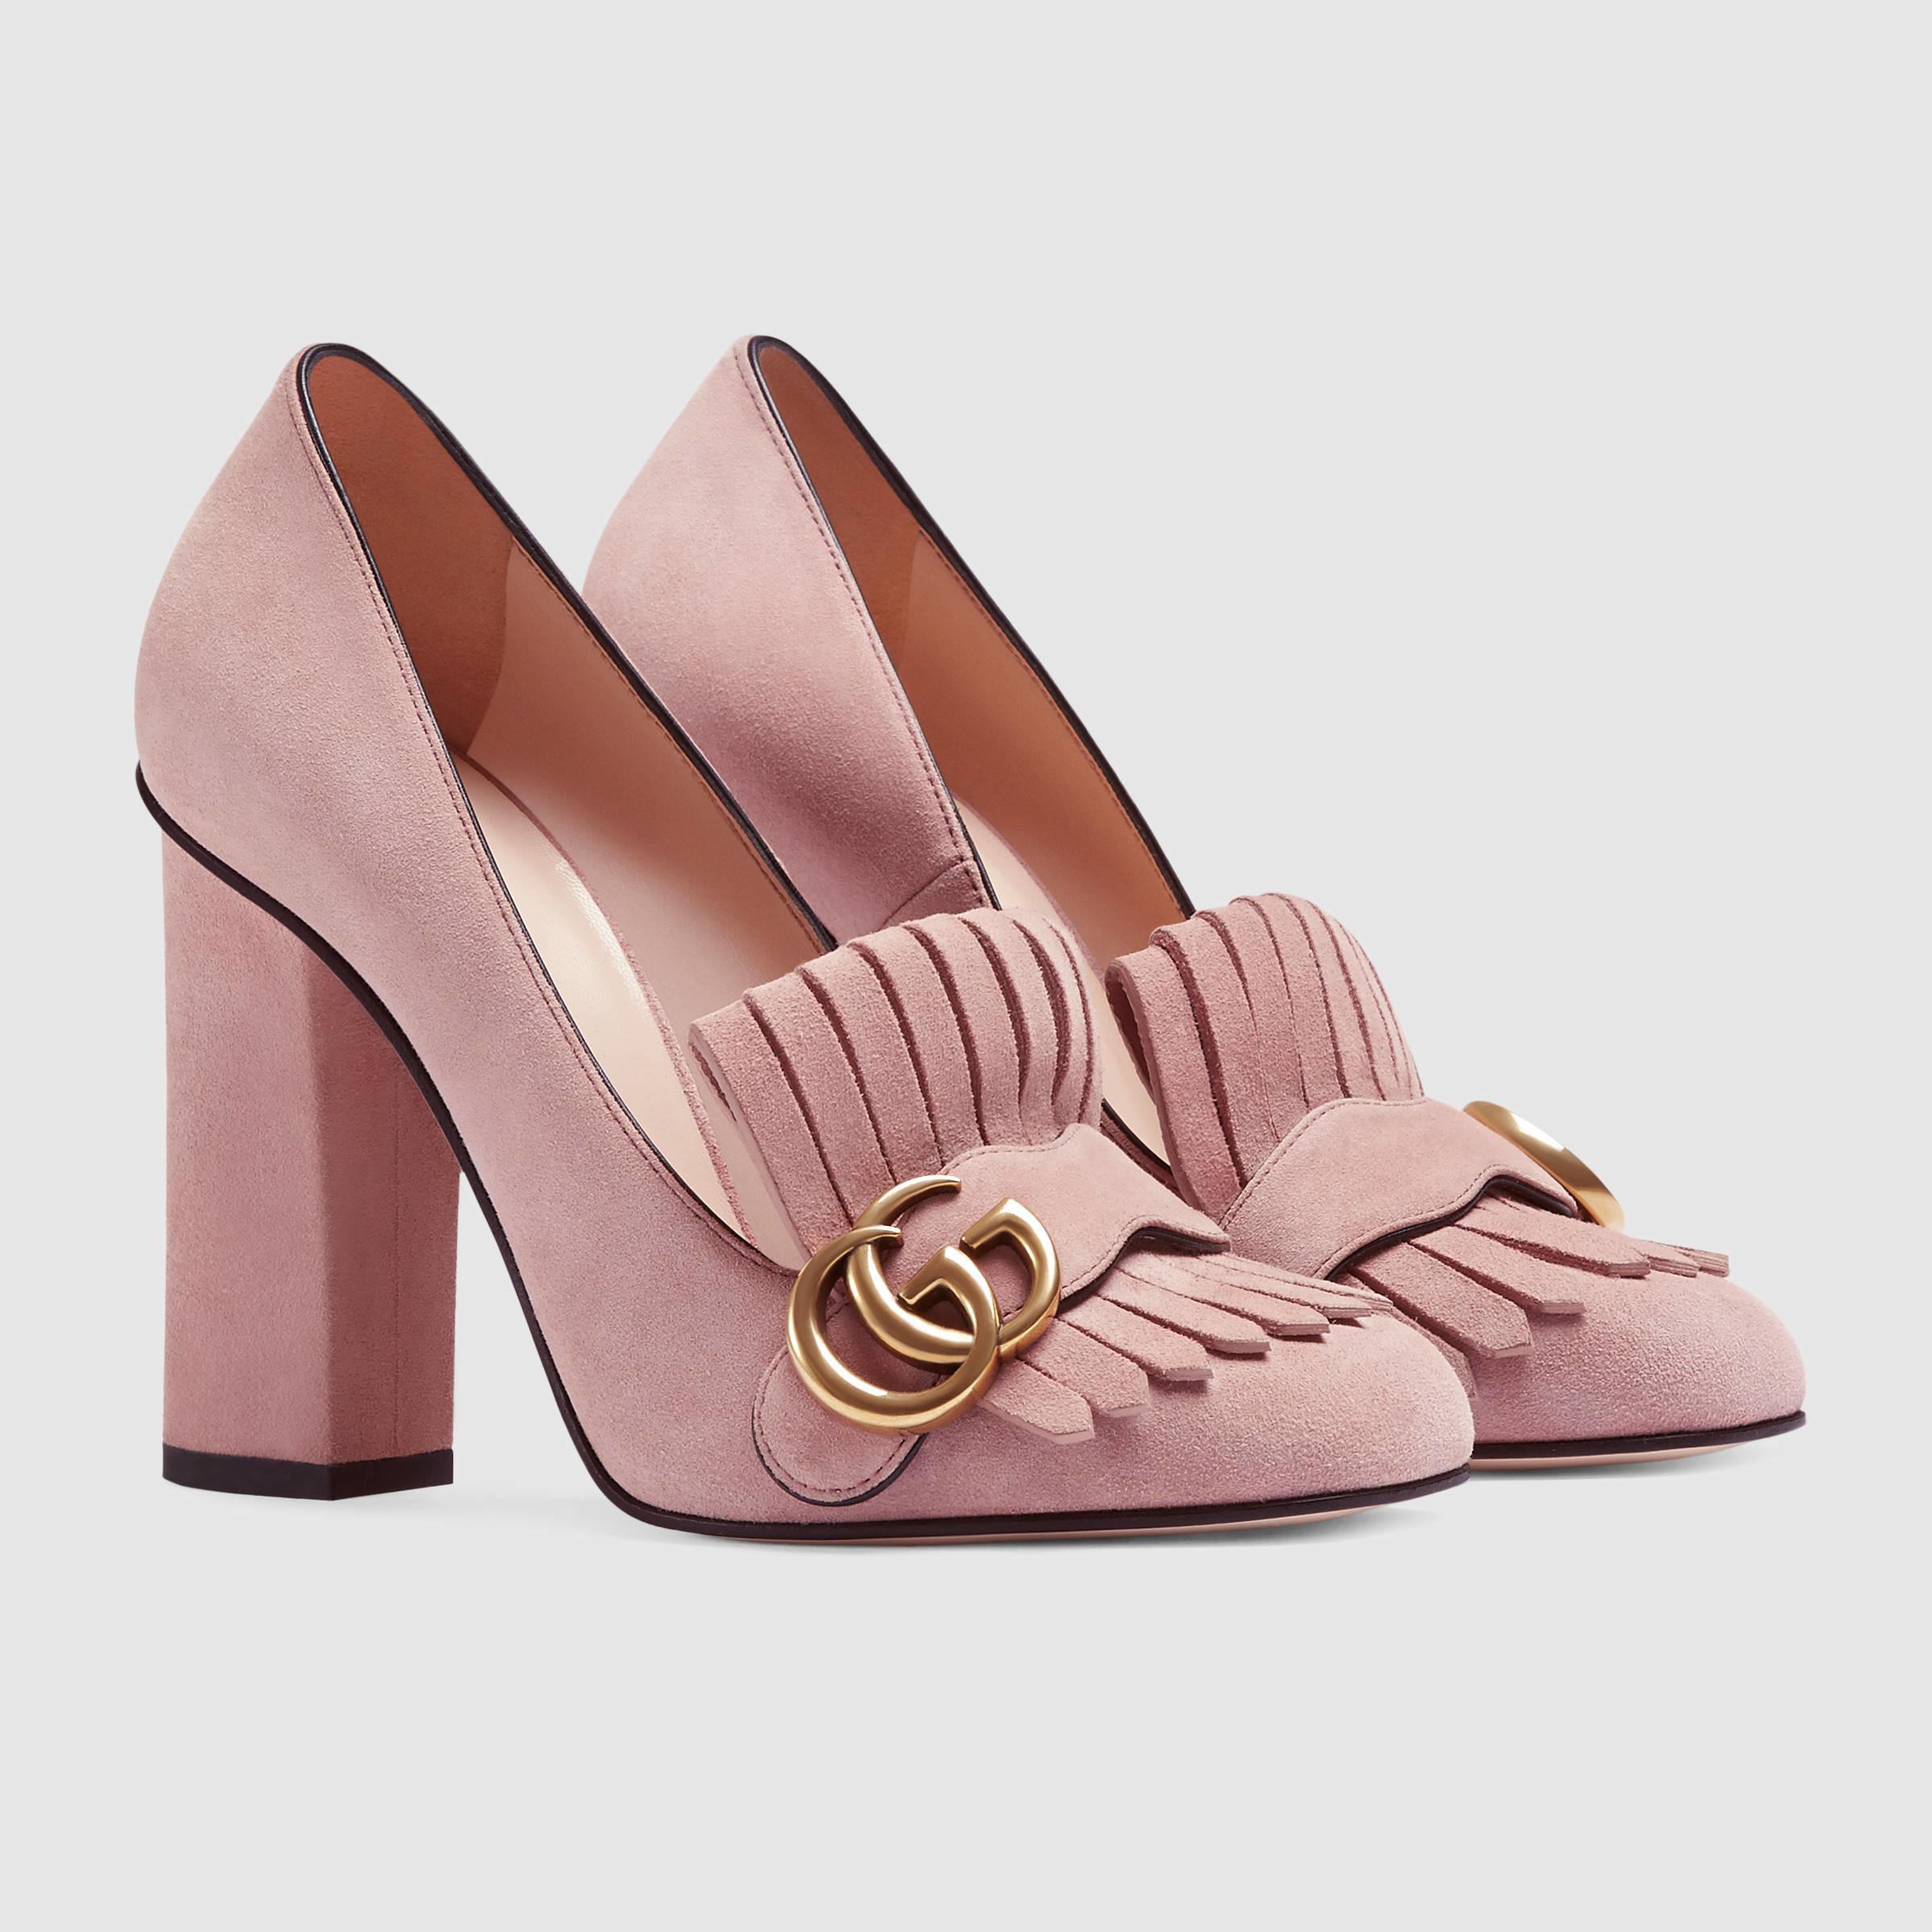 bfc37ba0ebf Lyst - Gucci Suede Pump in Pink